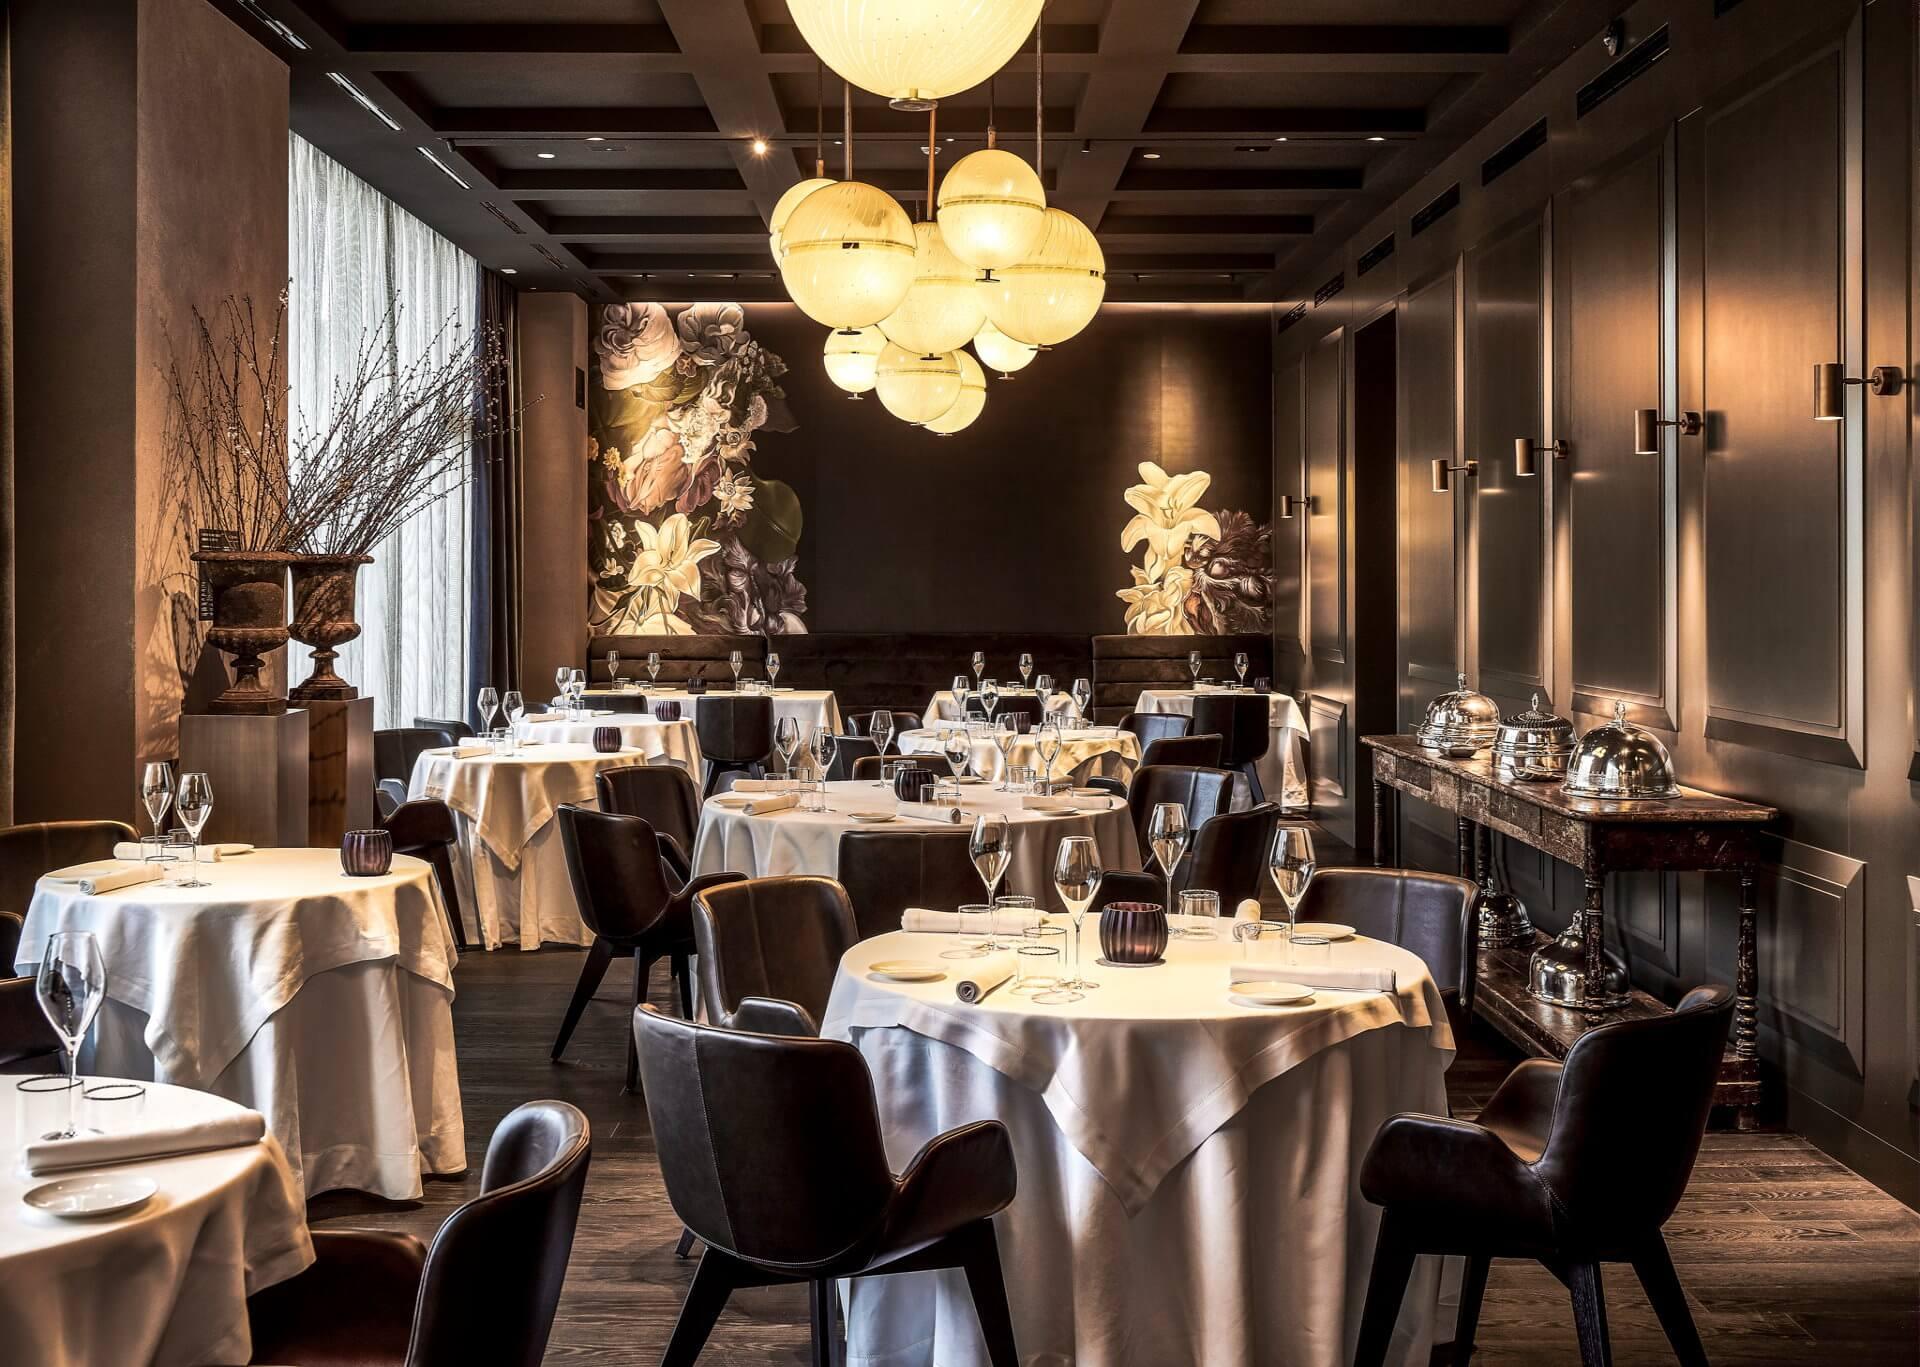 Interior Design for Restaurant and Hotel